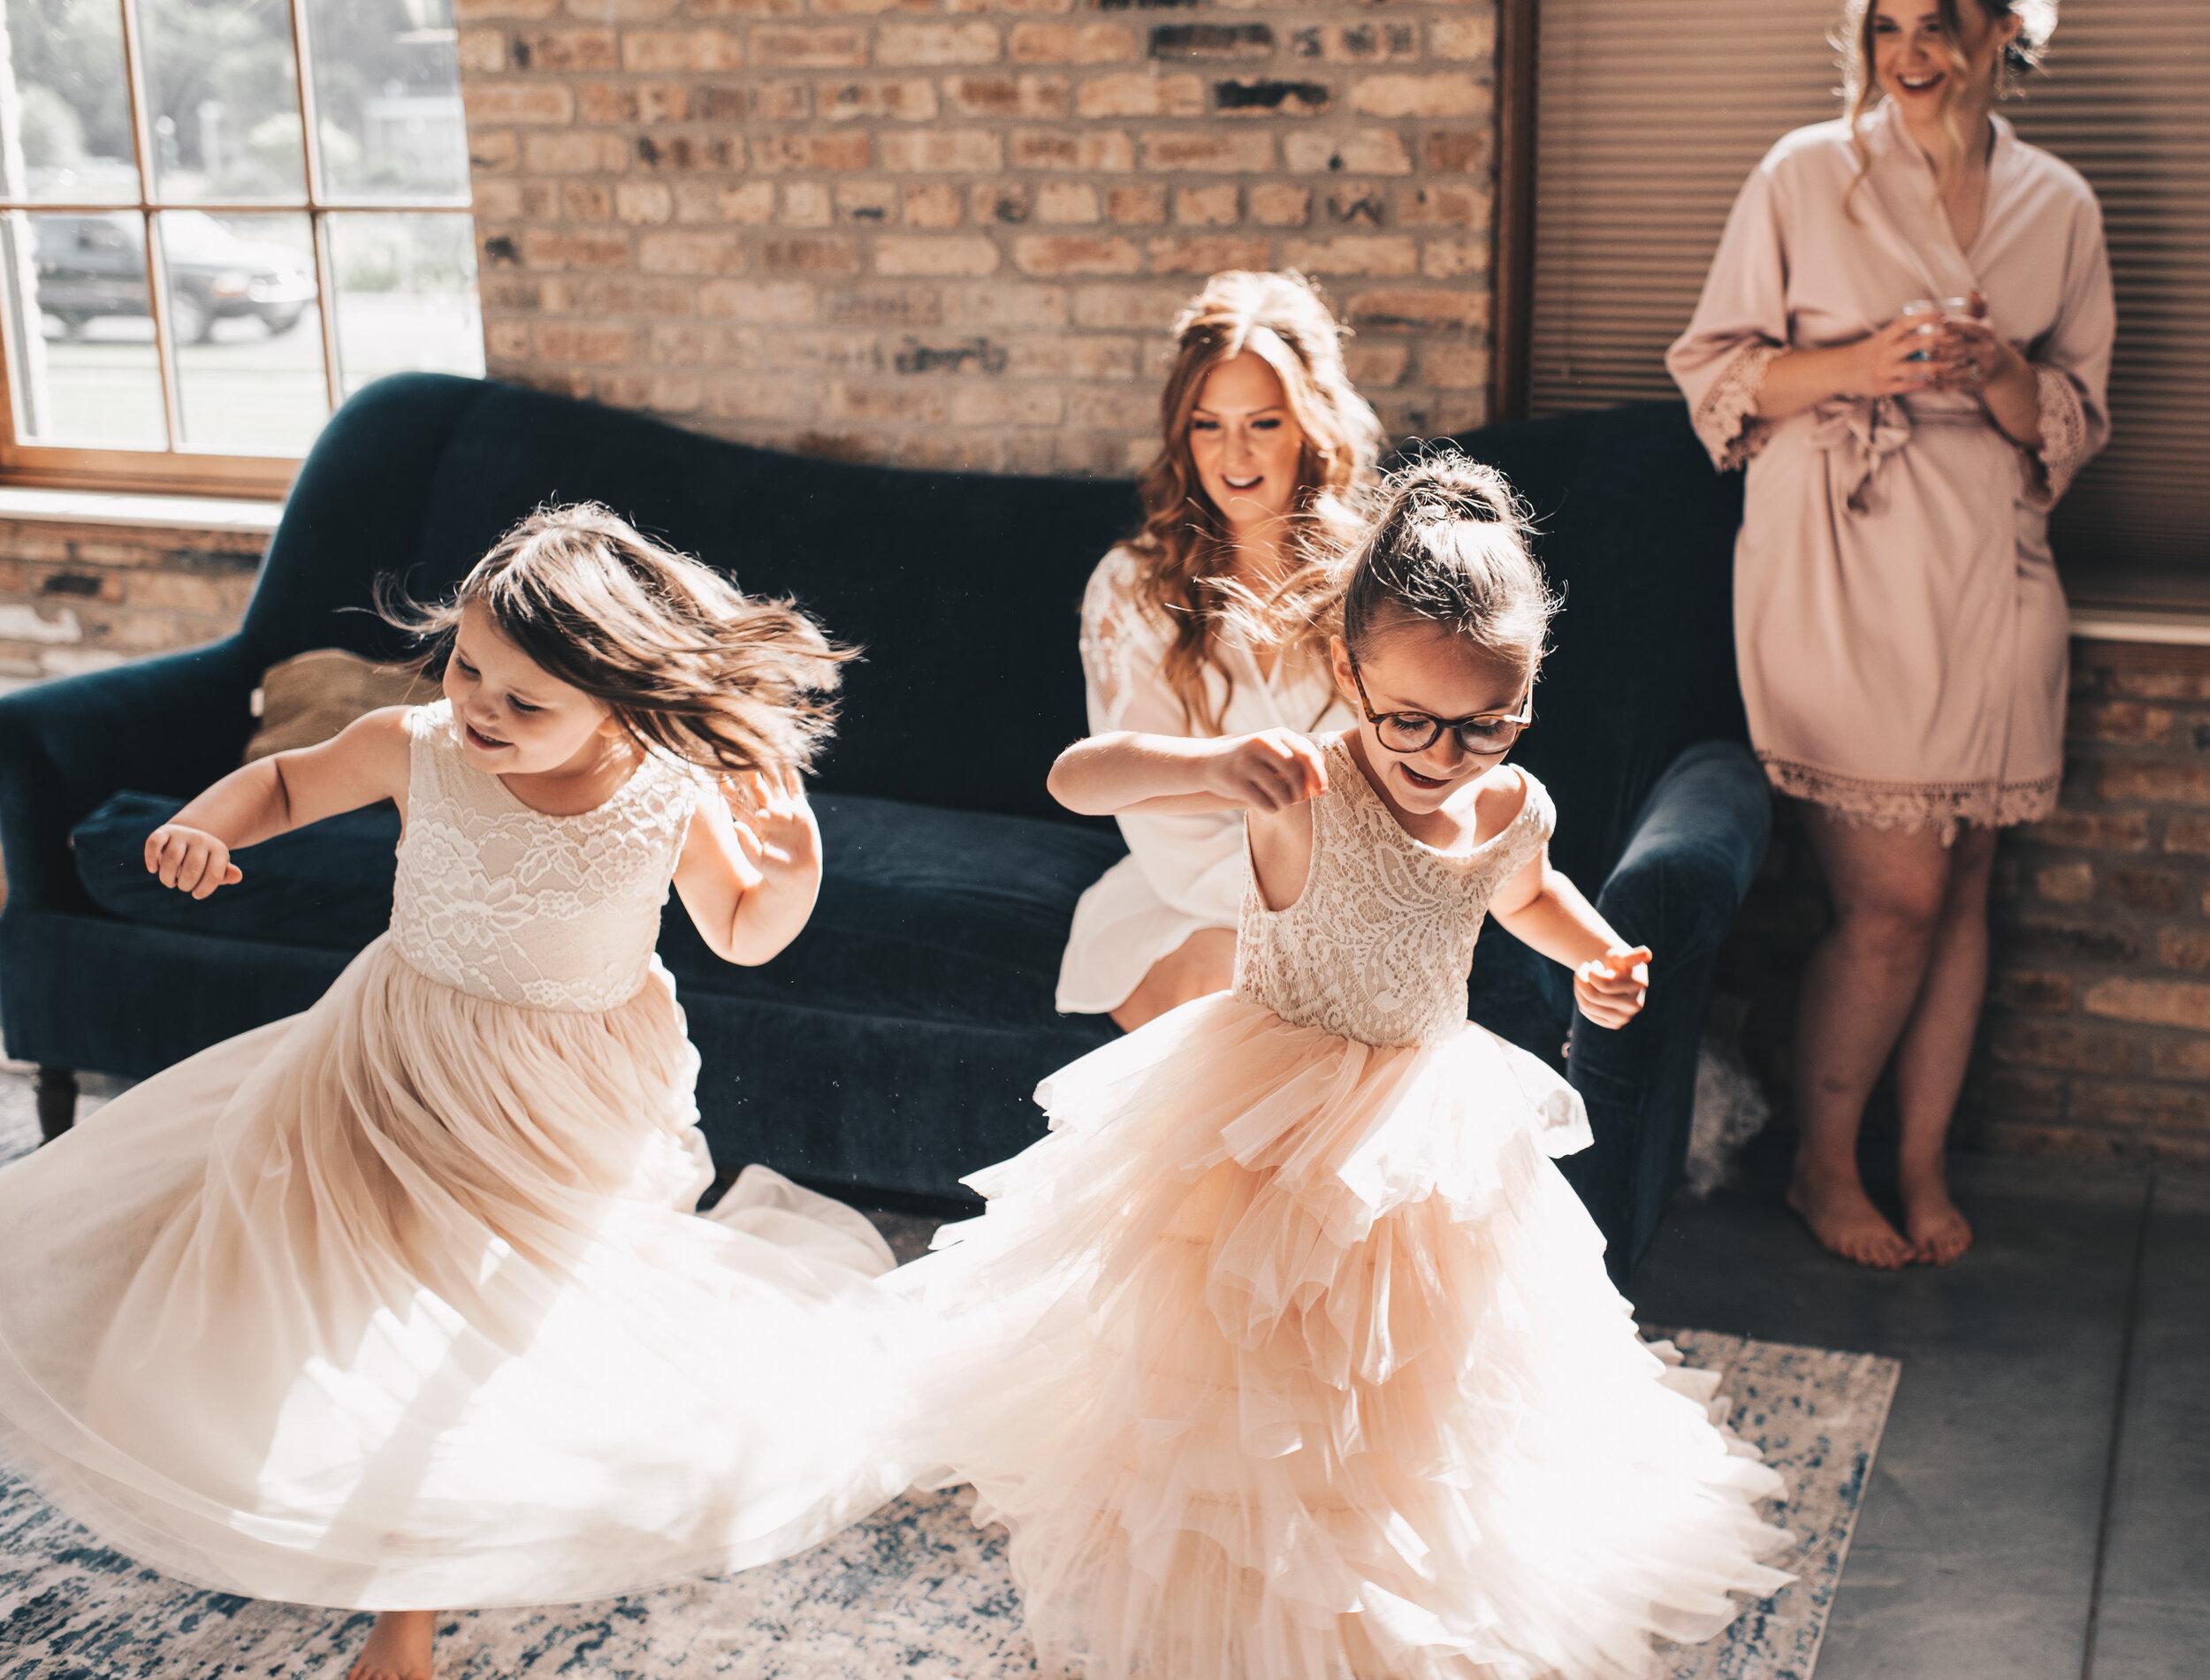 Modern Industrial Wedding, The Brix on the Fox, The BRIX, Wedding Detail Photos, Modern Midwest Wedding, The Brix on the Fox Wedding, The BRIX Wedding, Bride Getting Ready Photos, Flower Girl Photos